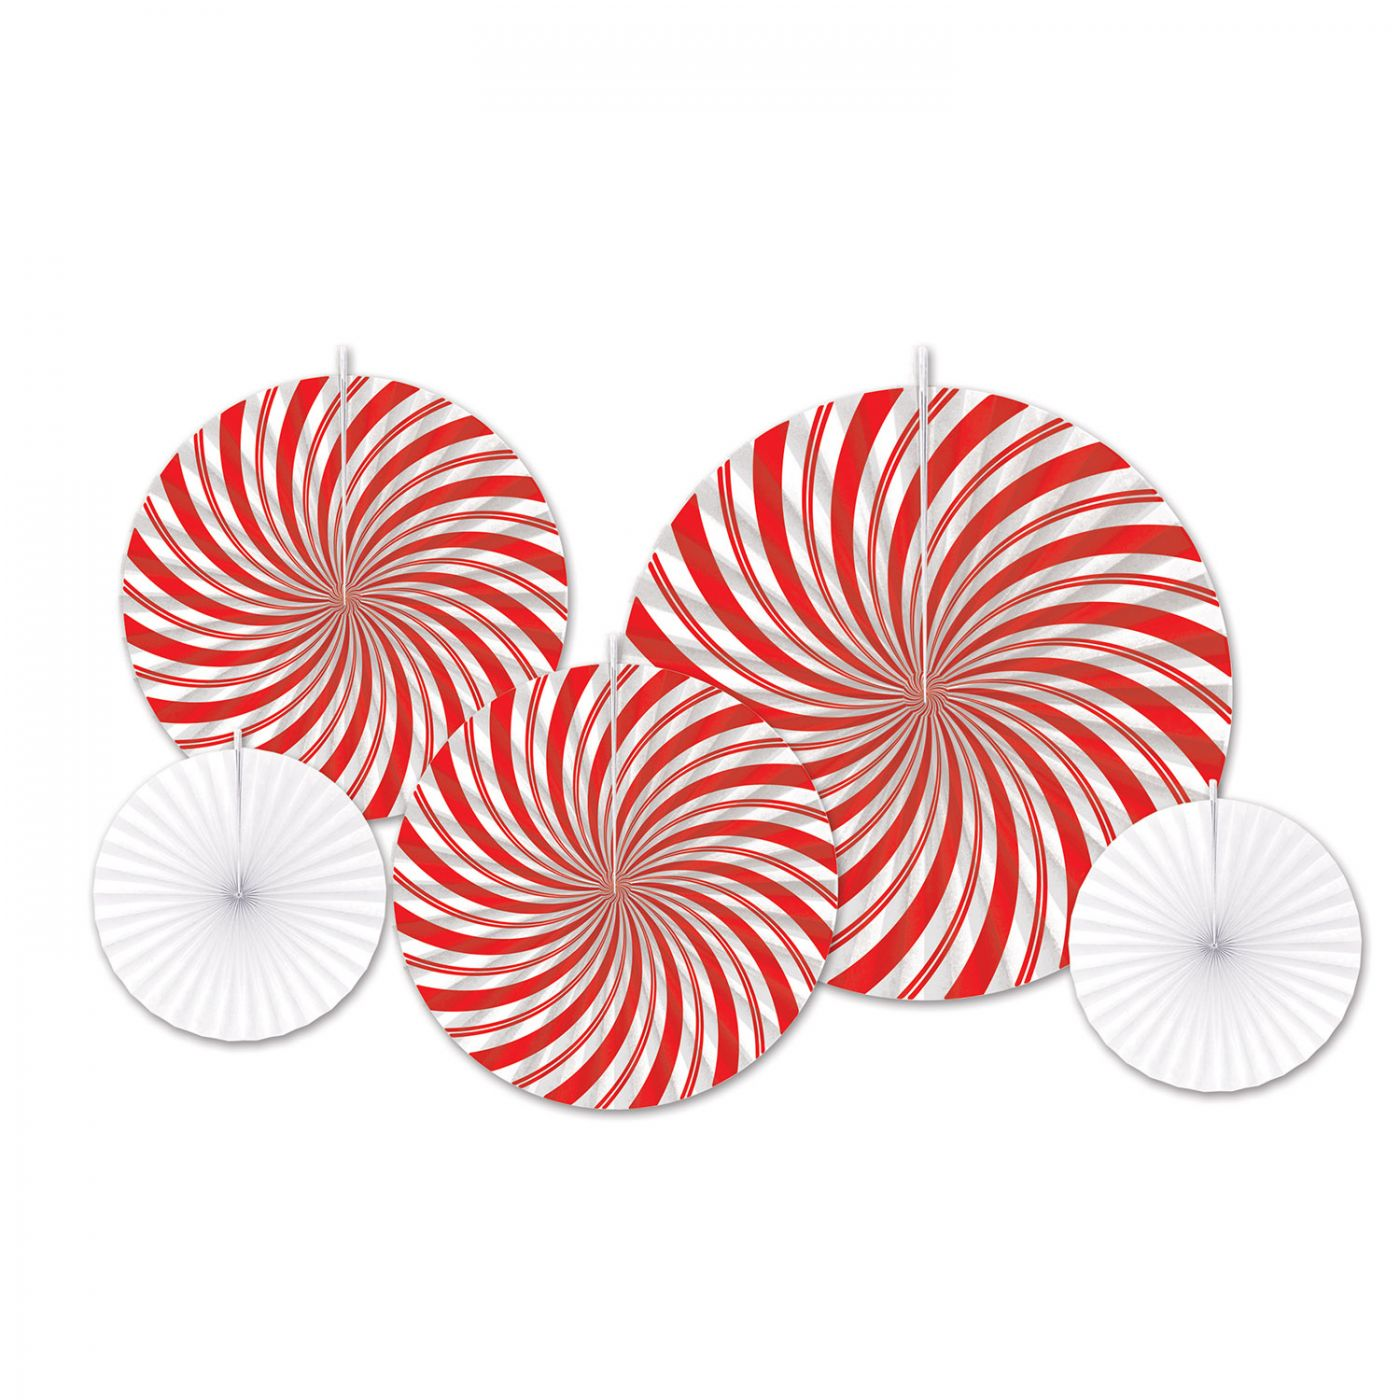 Peppermint Accordion Paper Fans image